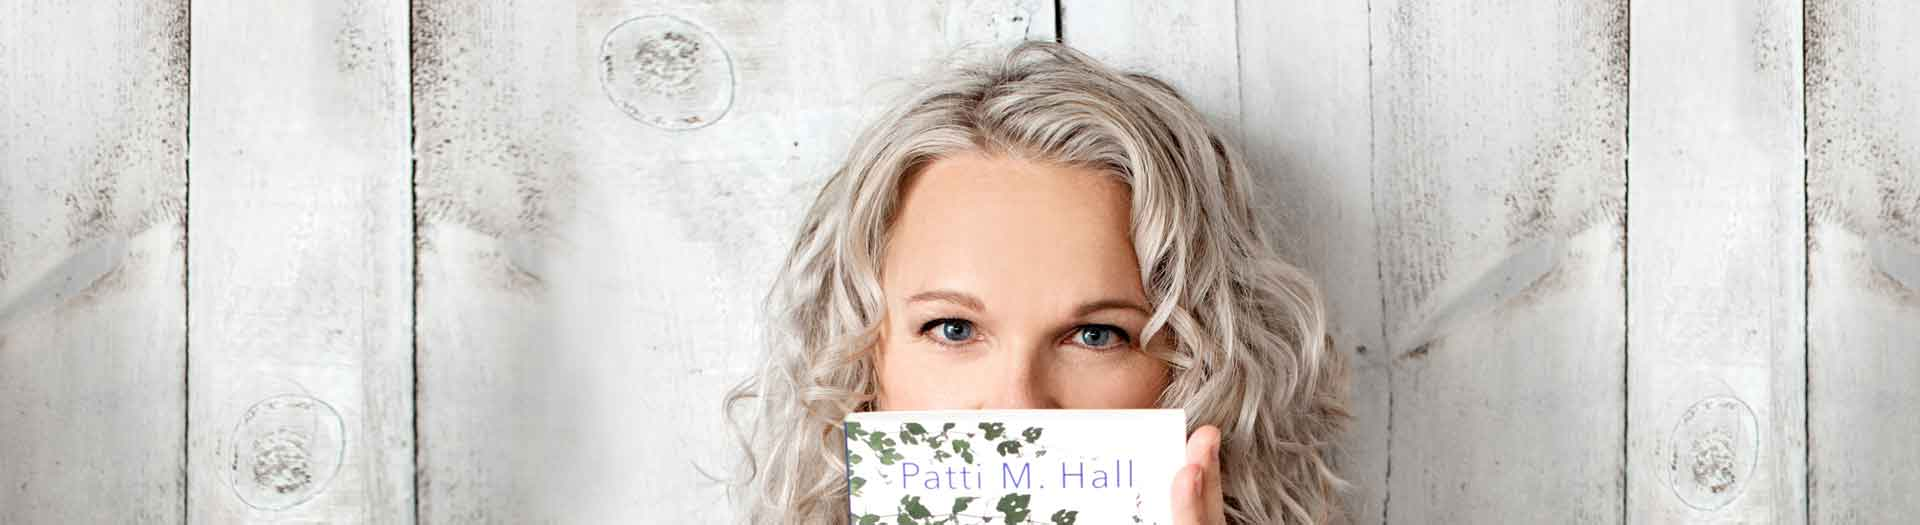 about-hero-patti-m-hall-book-coach-memoir-writer